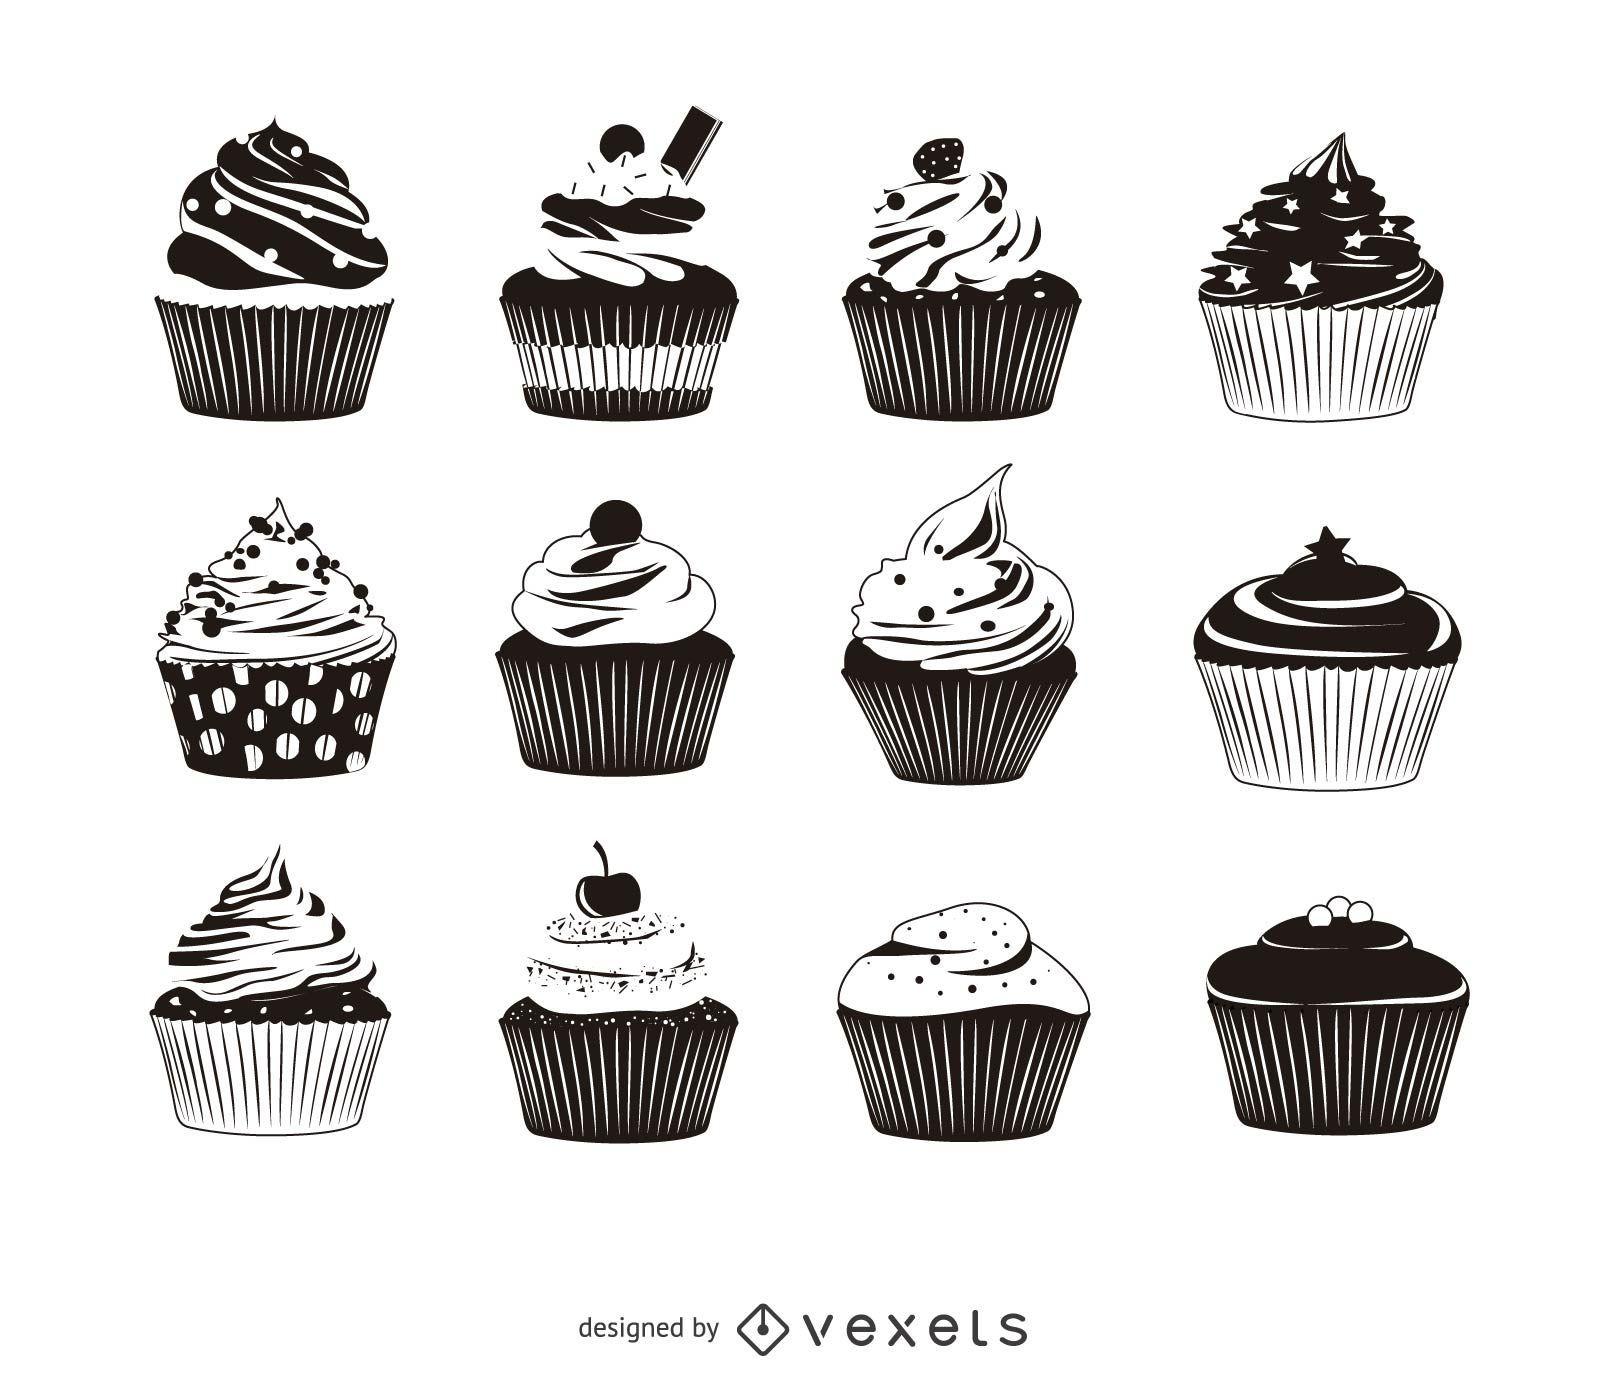 12 cupcake silhouette pack